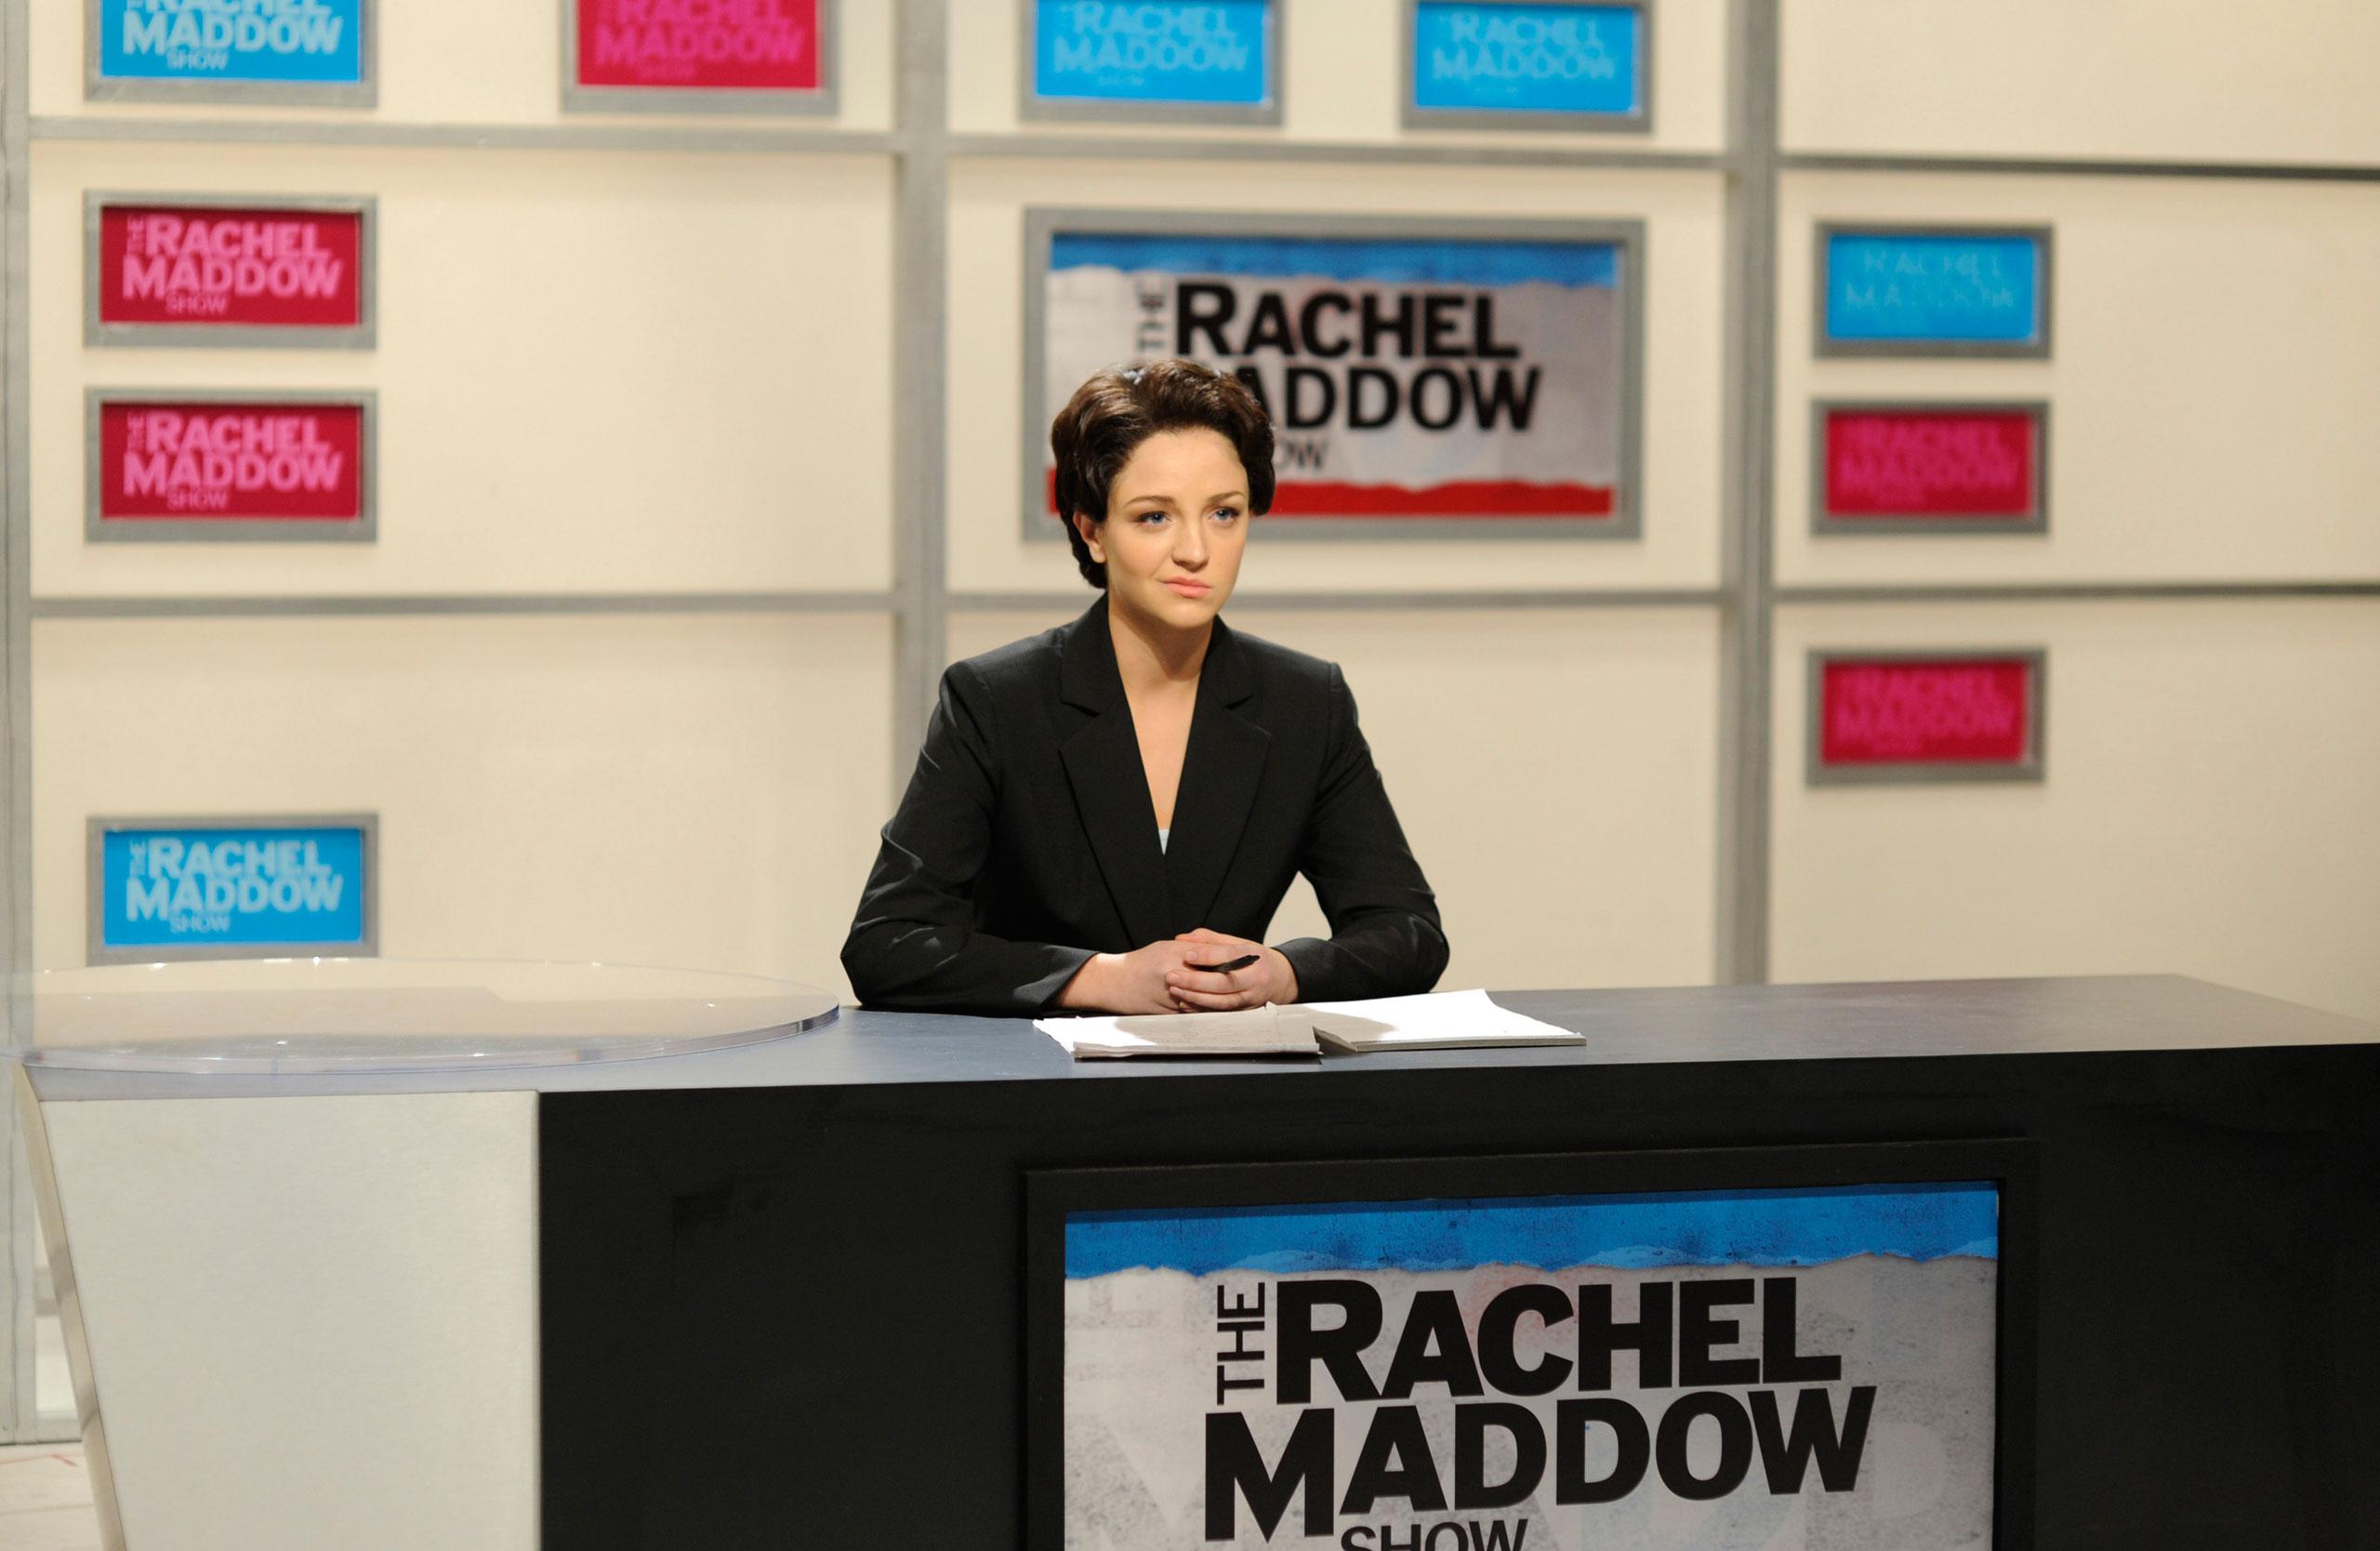 Abby Elliott as Rachel Maddow during The Rachel Maddow Show skit on Jan. 10, 2009.